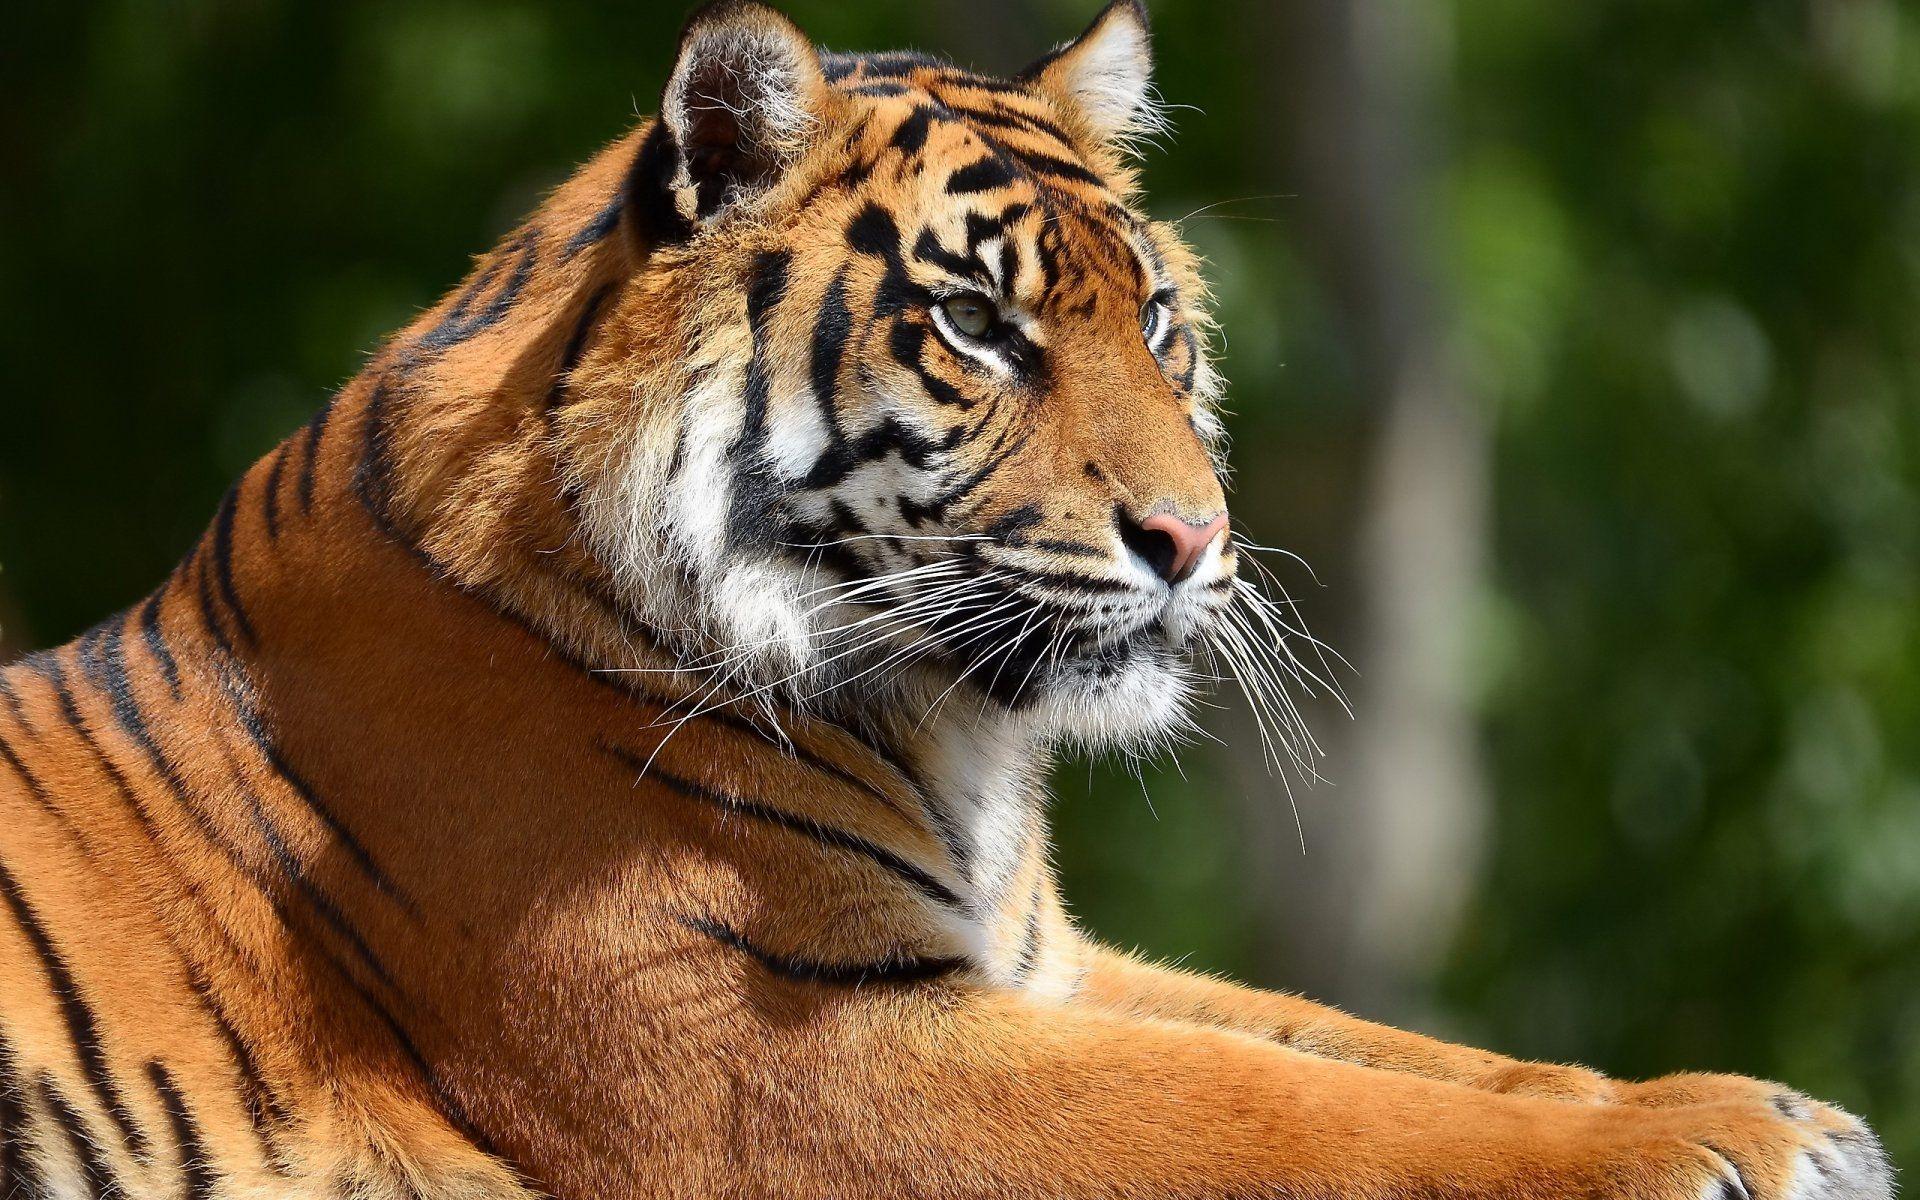 Tiger, Free Download Wallpaper